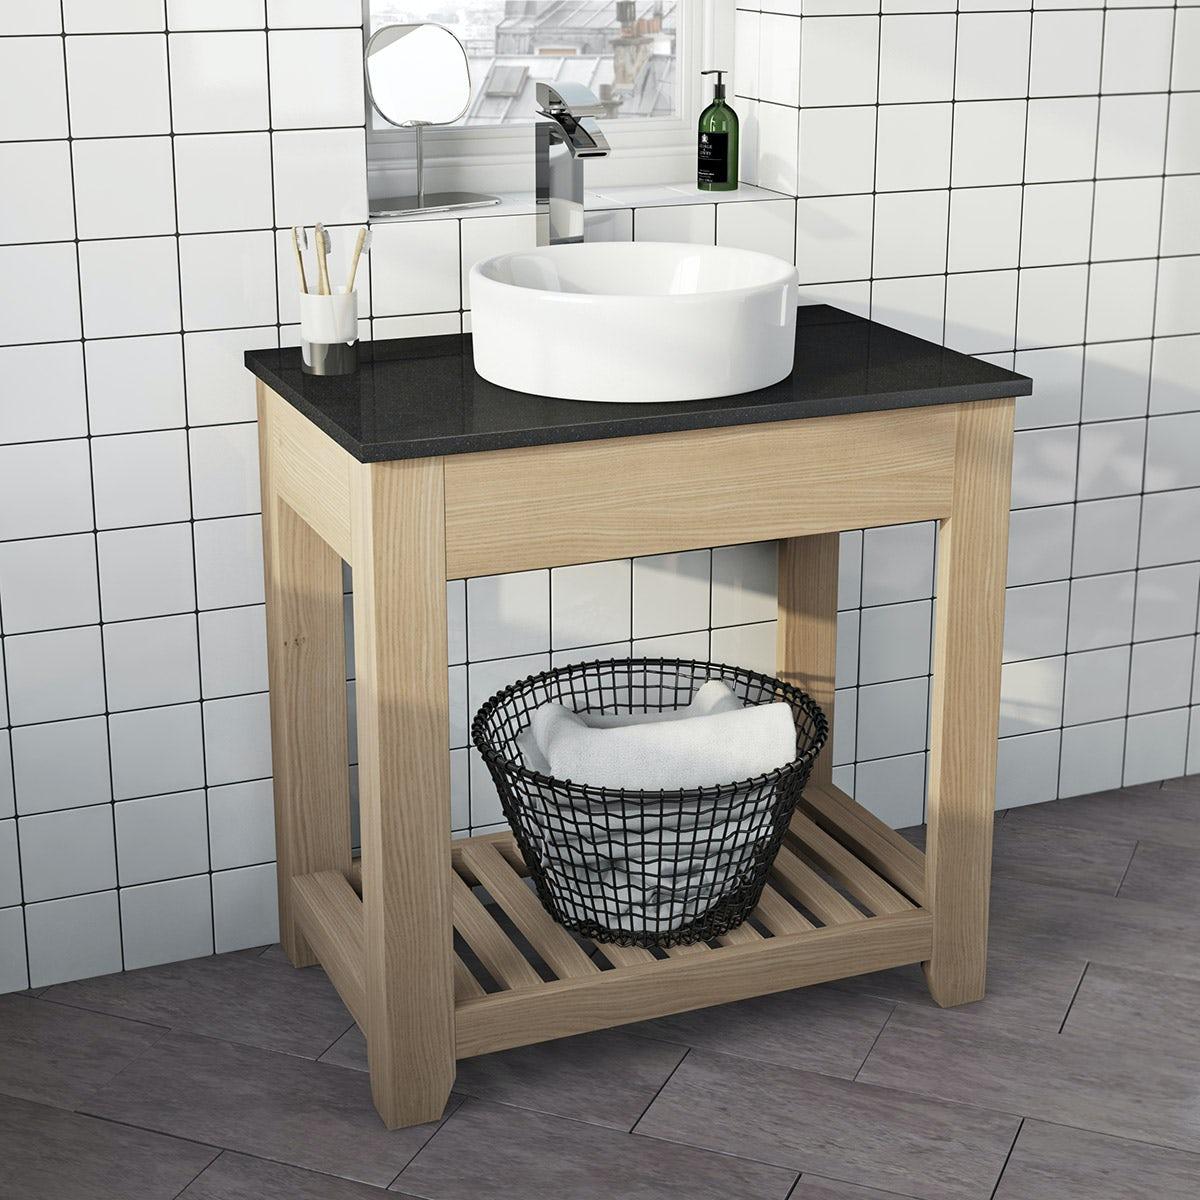 The Bath Co. Hoxton oak washstand with black marble top and Calhoun basin 800mm